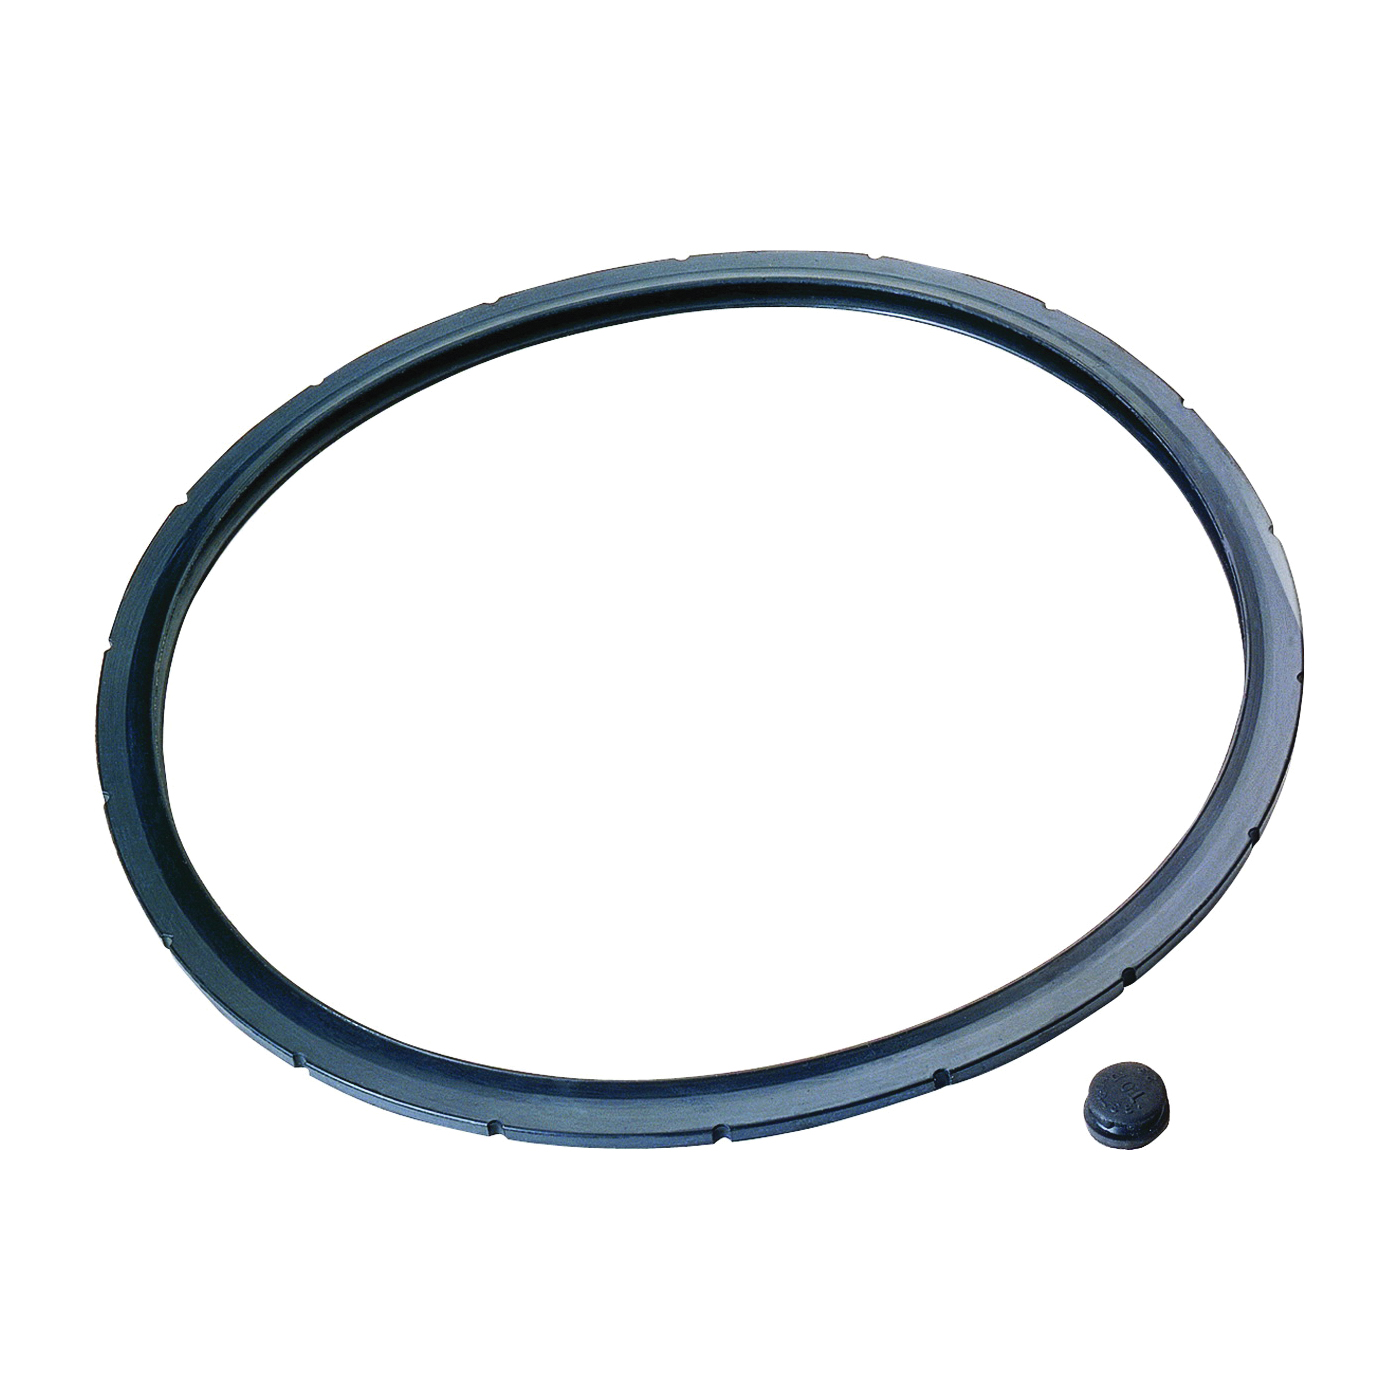 Picture of Presto 09924 Pressure Cooker Sealing Ring